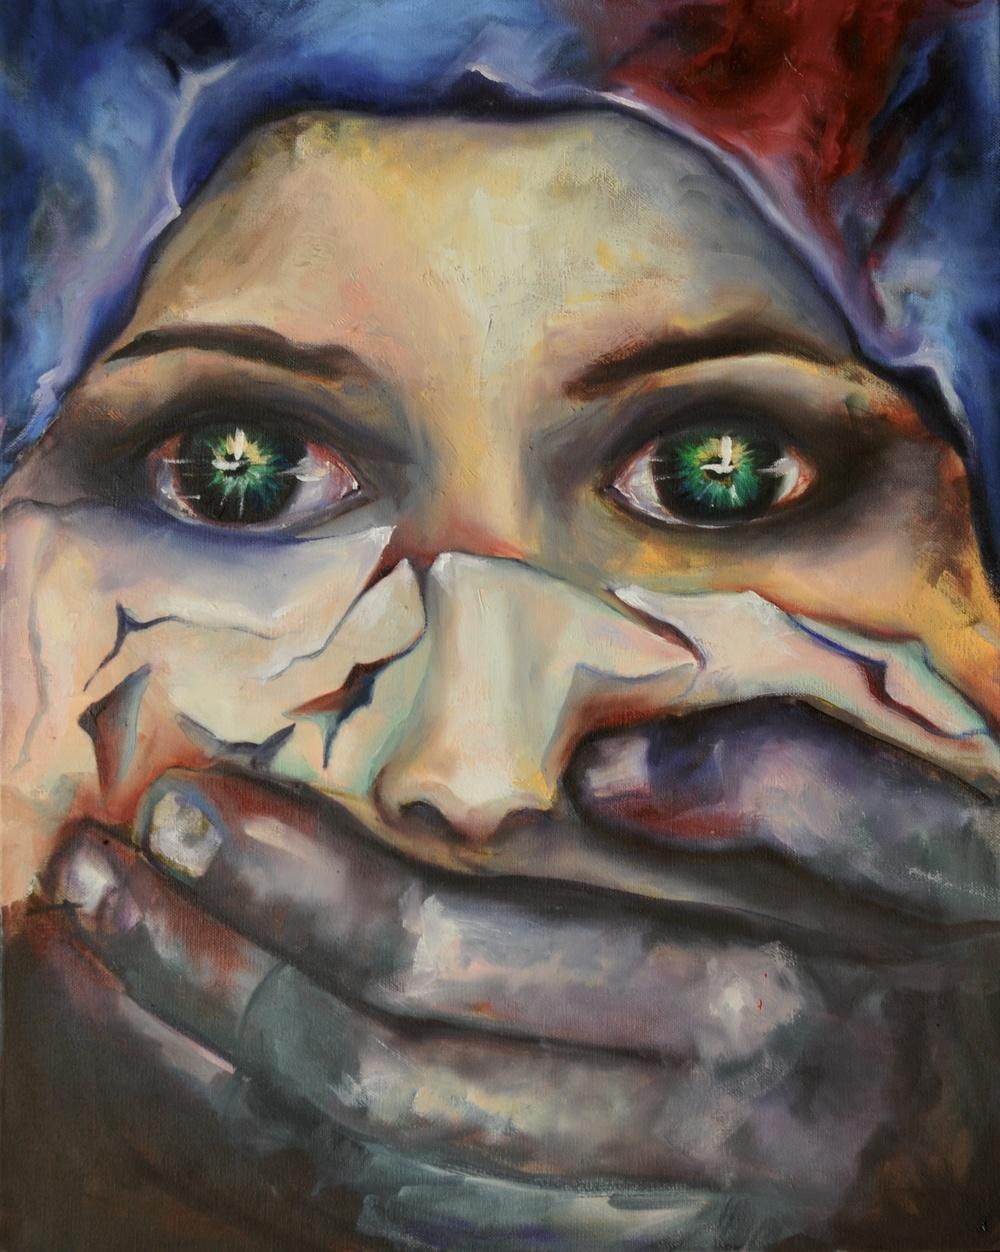 Tribute to Malala  Oil on Linen 50 x 40 cm  2012